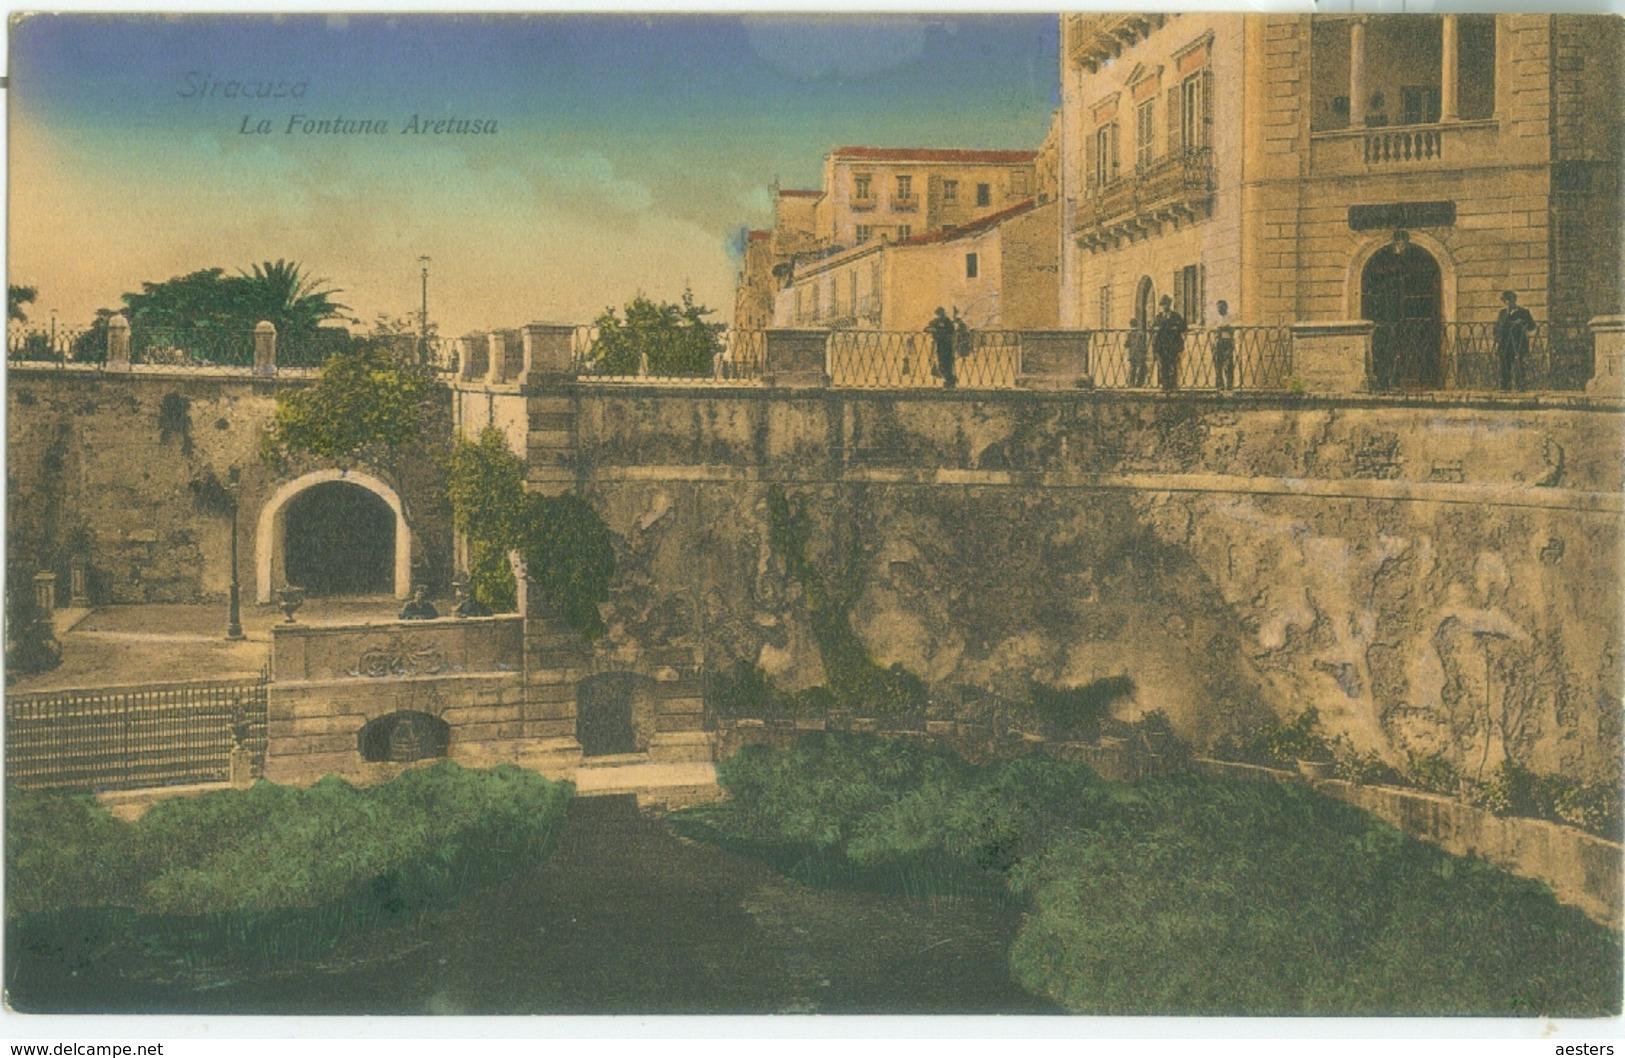 Siracusa; La Fontana Aretusa - Non Viaggiata. (Santoro - Siracusa) - Siracusa